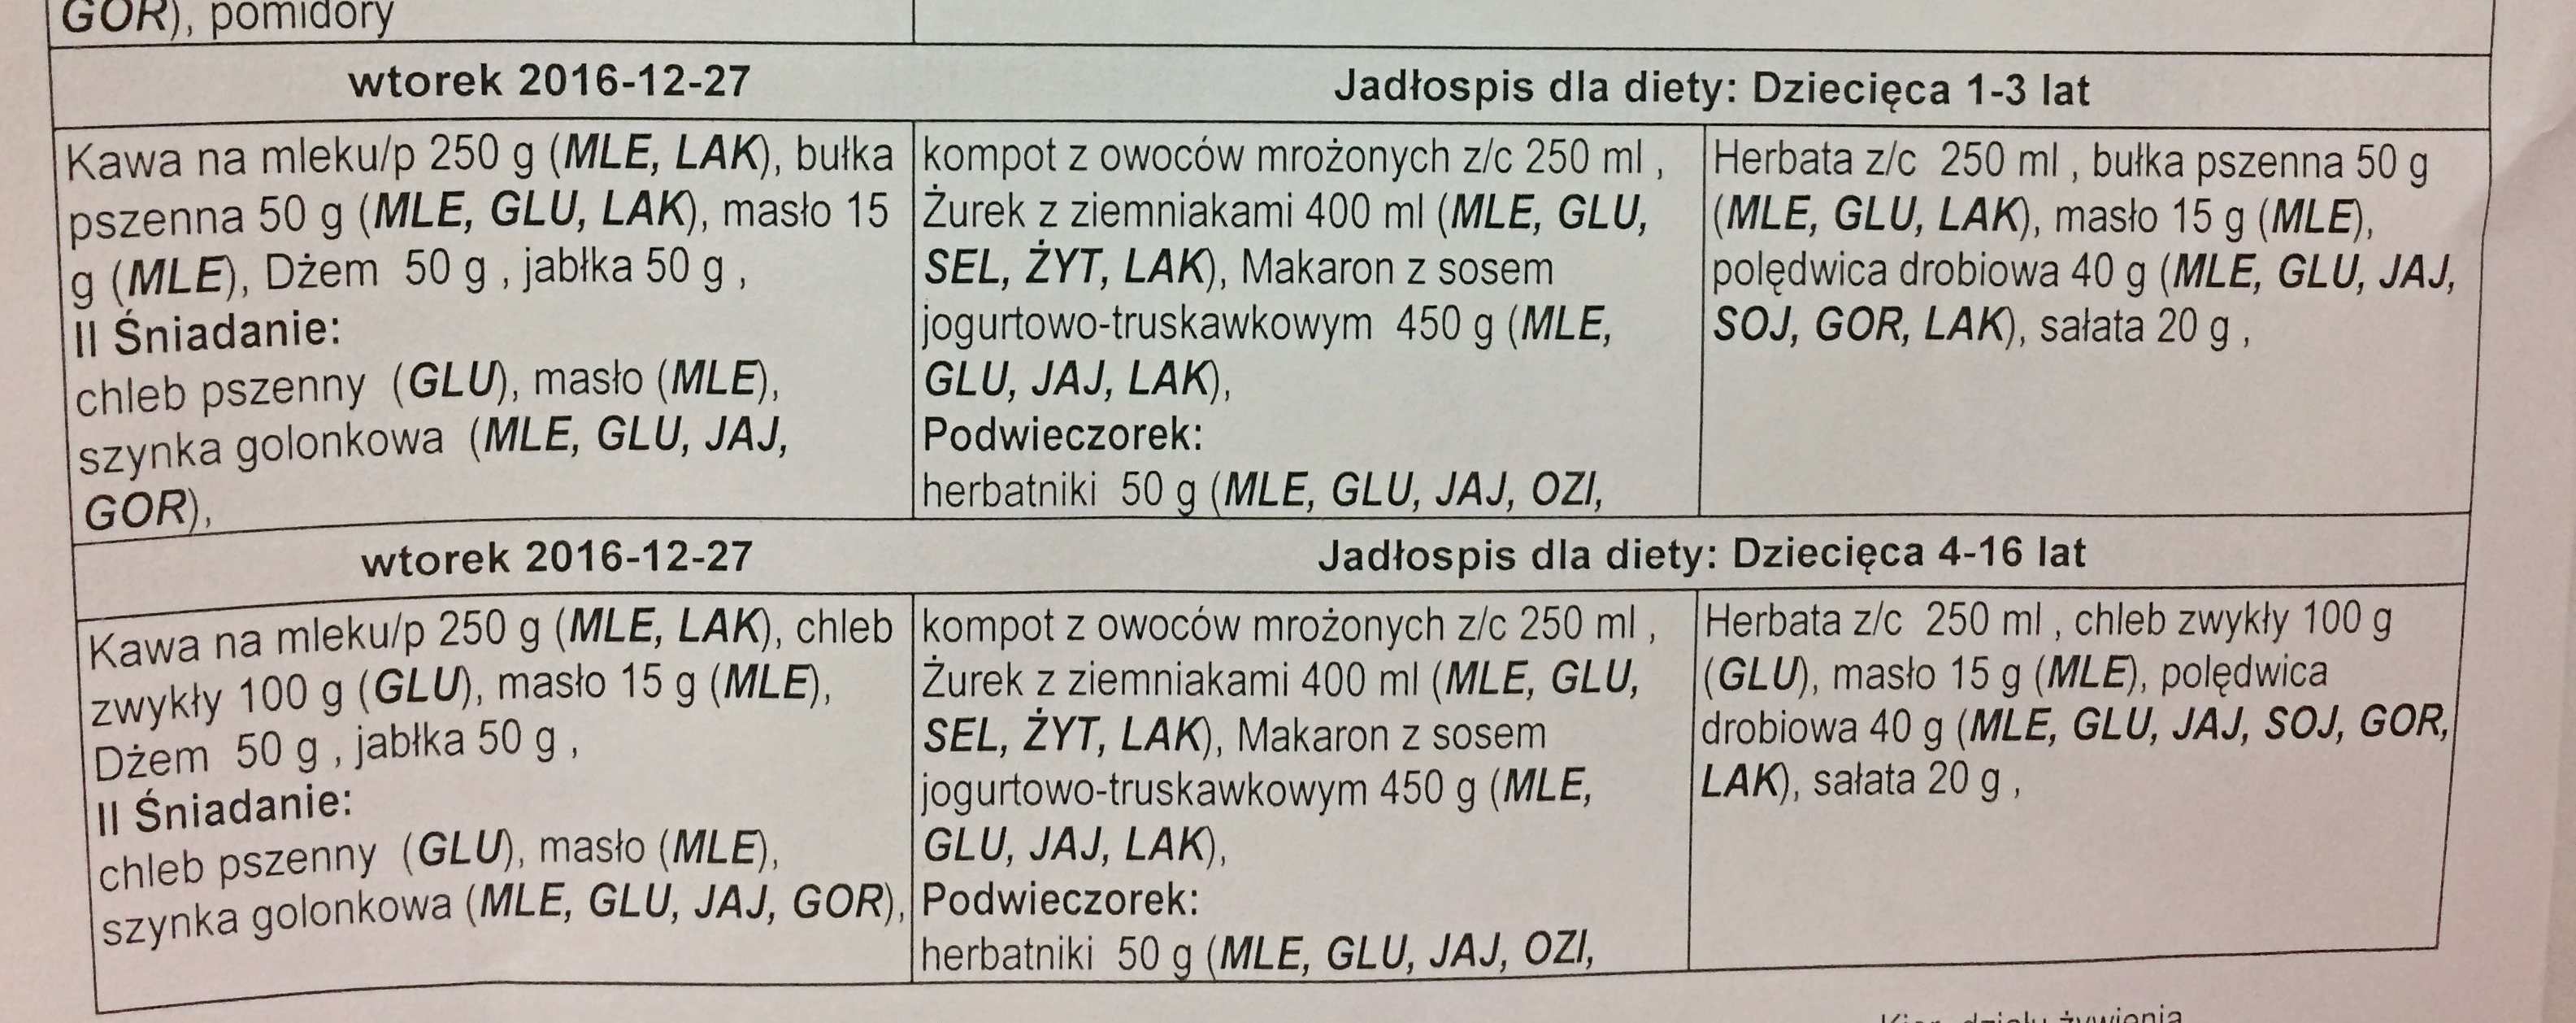 img_2023